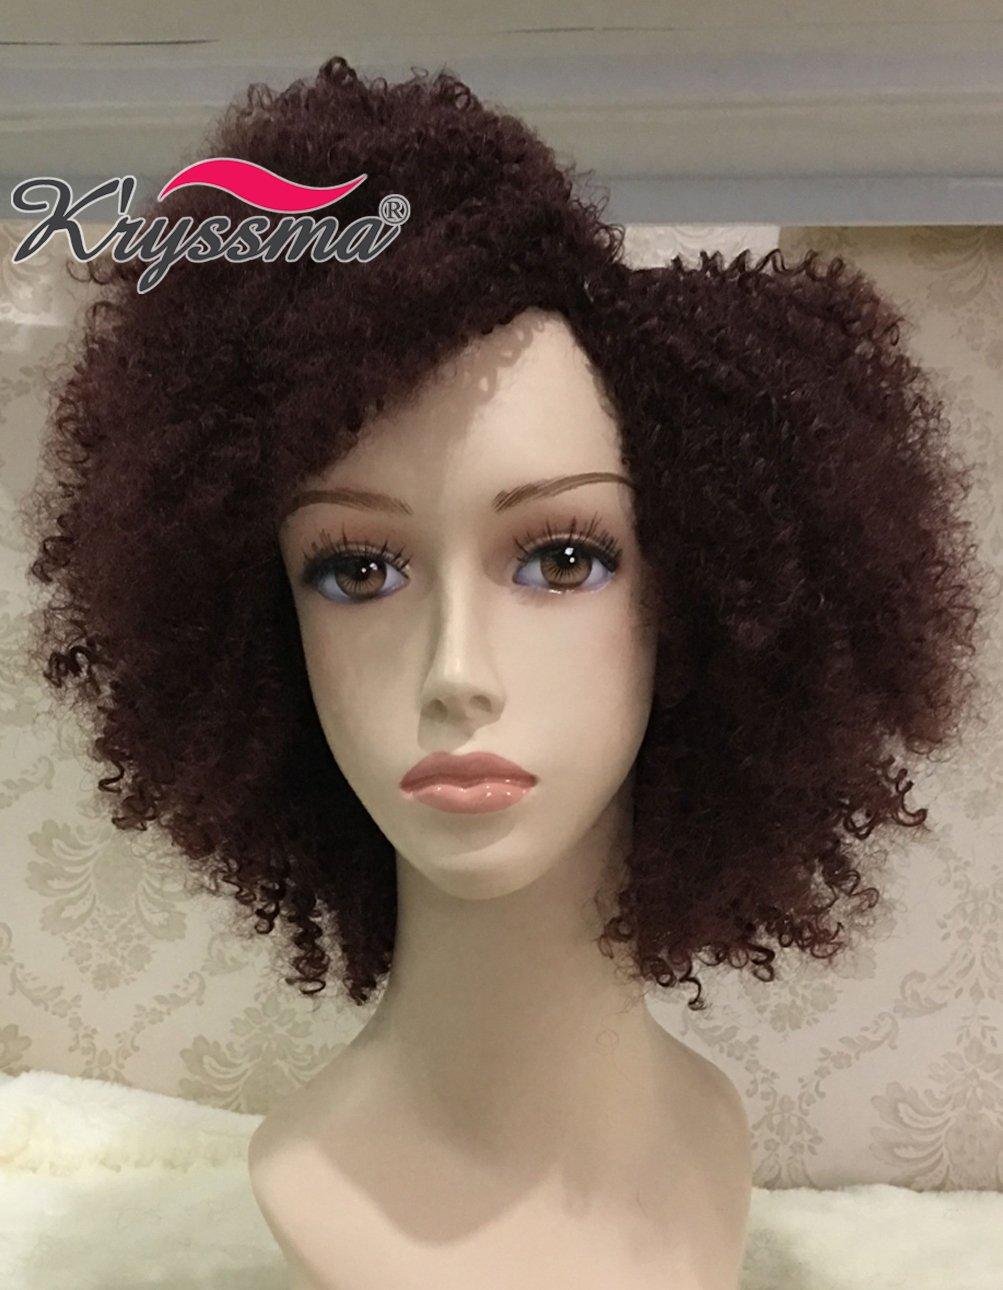 Amazon.com: K'ryssma Natural Looking Afro Kinky Curly Wigs